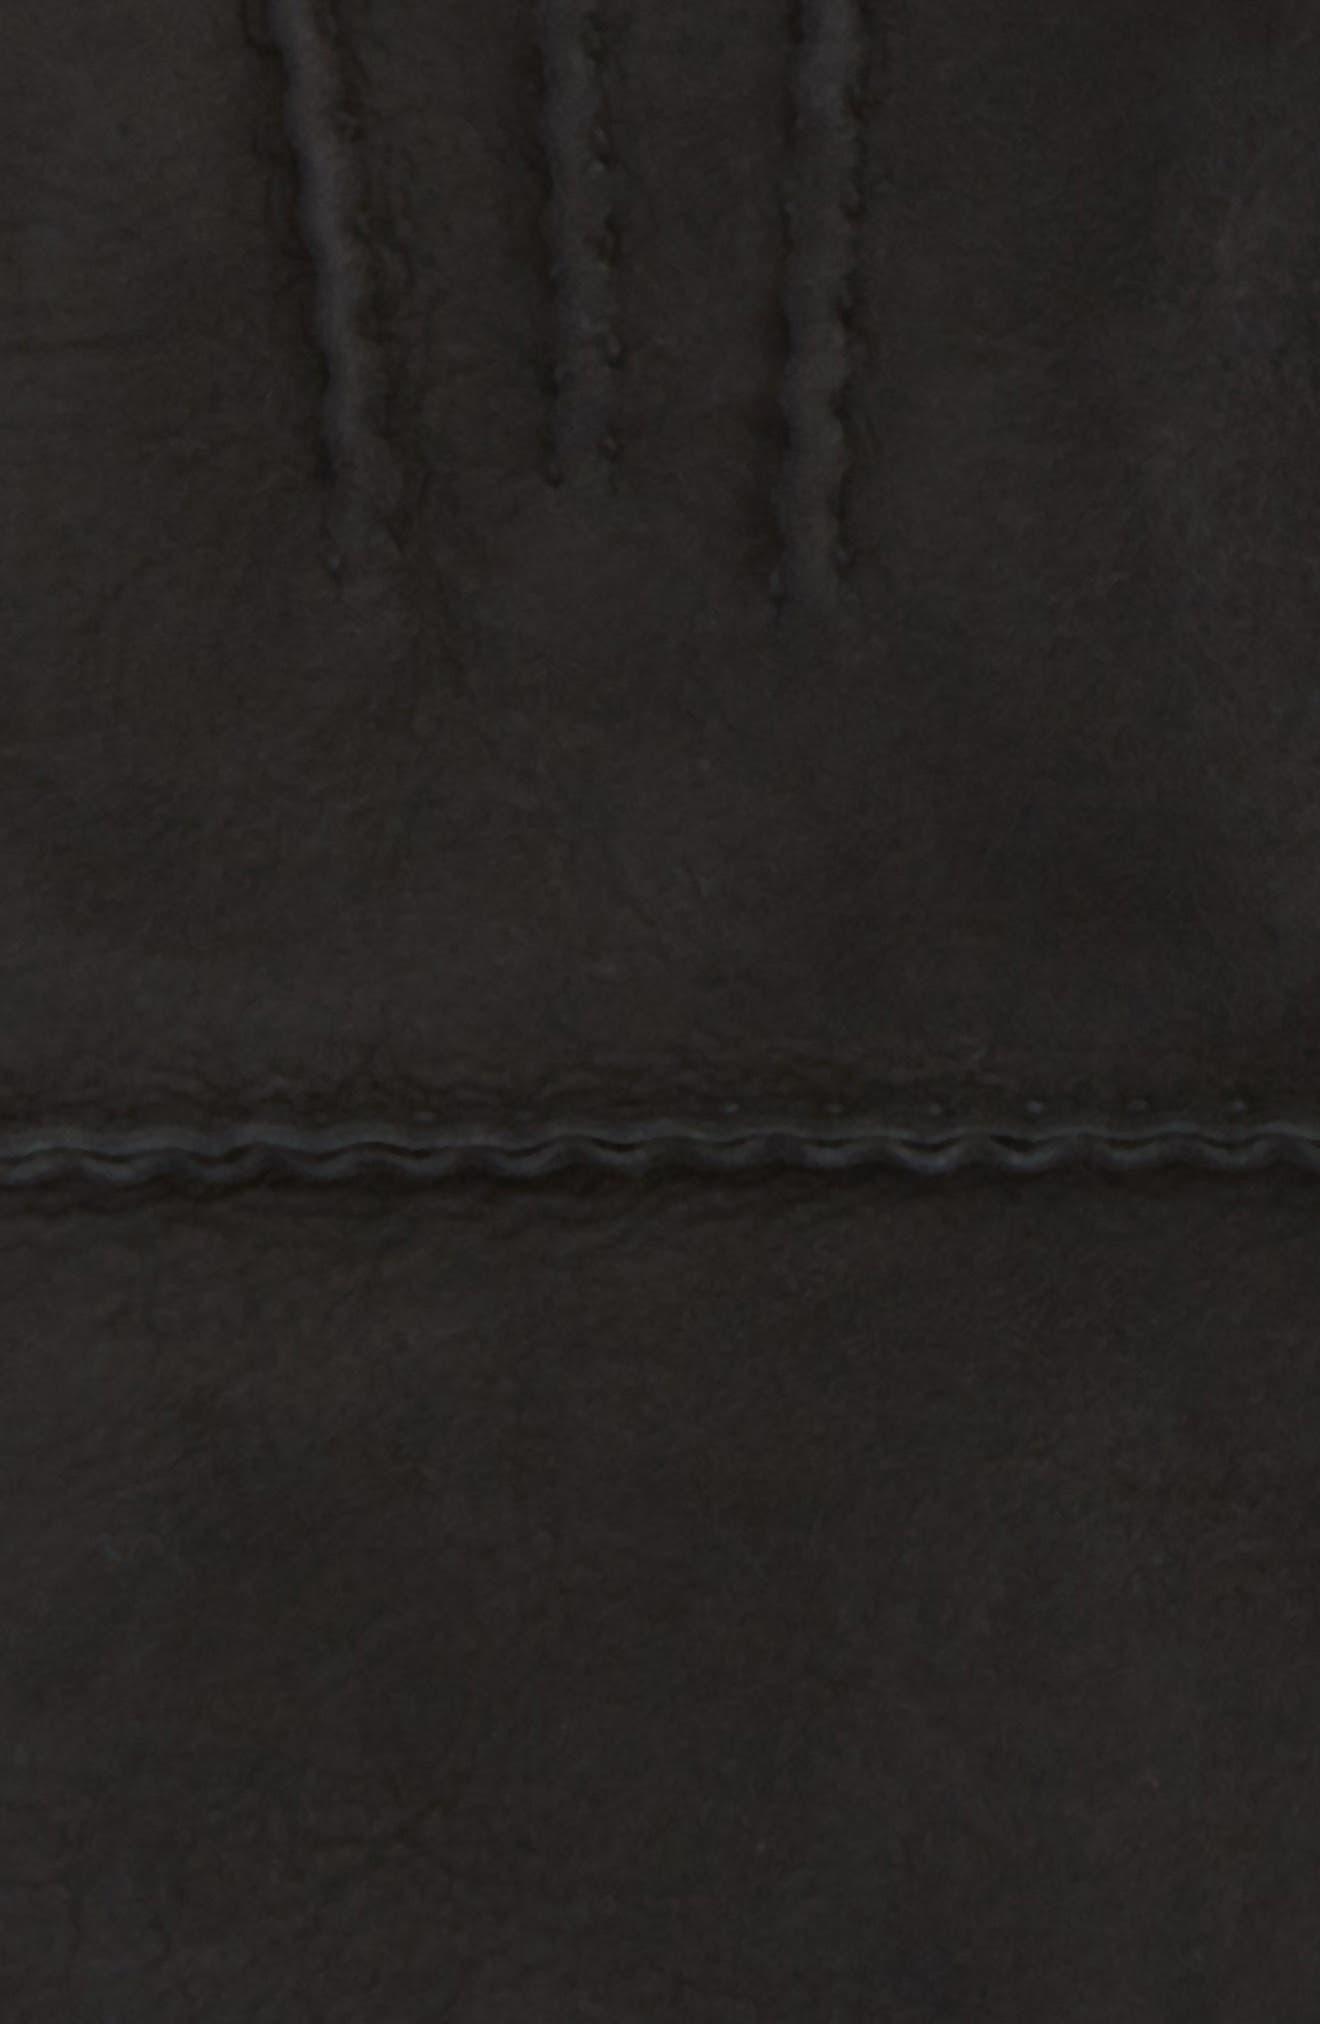 UGG<sup>®</sup> Long Slim Genuine Shearling Gloves,                             Alternate thumbnail 2, color,